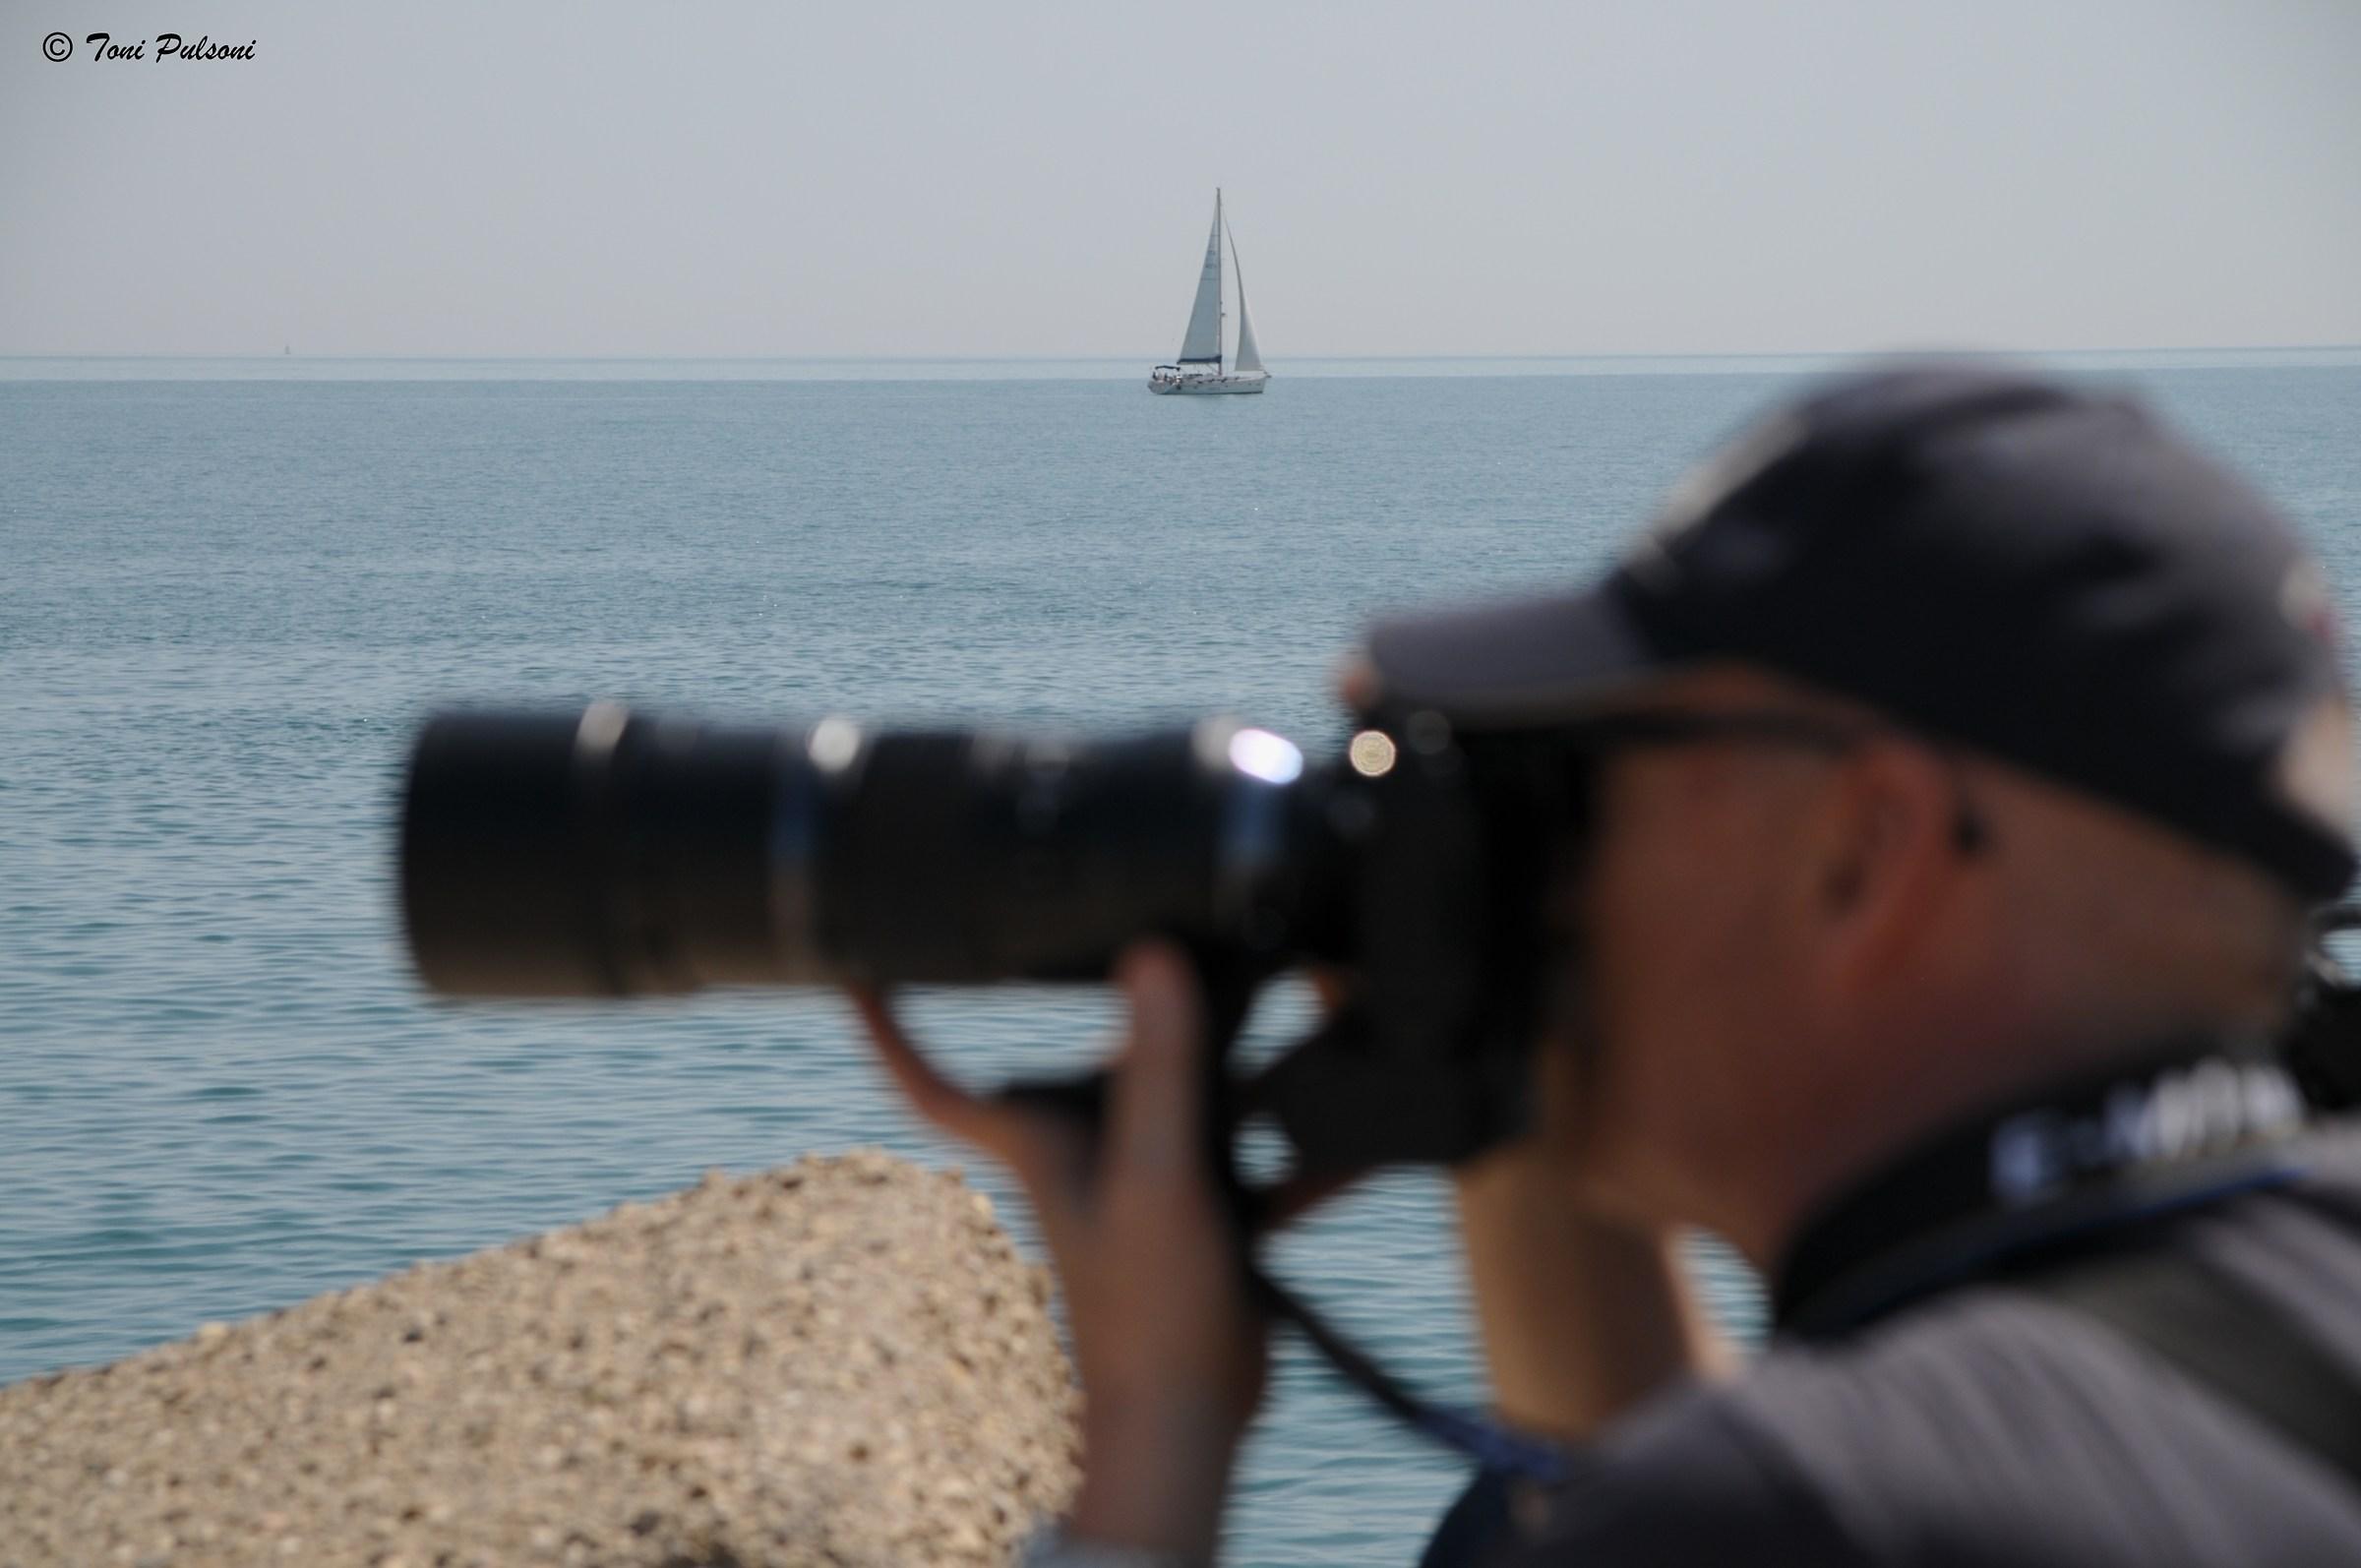 The amateur photographer...